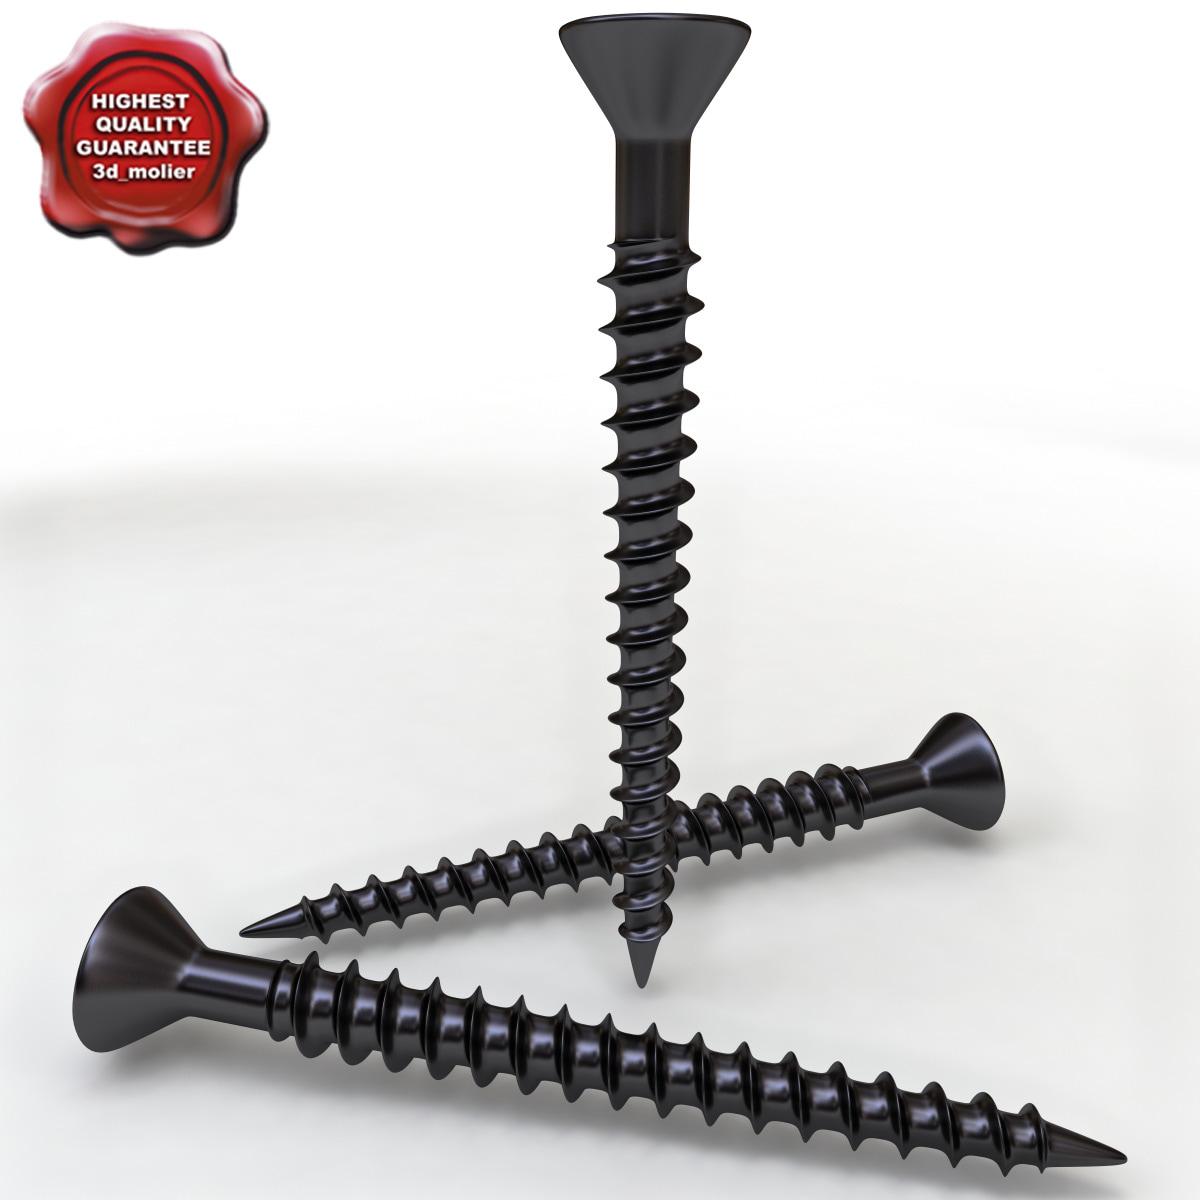 3ds max wood screw v2